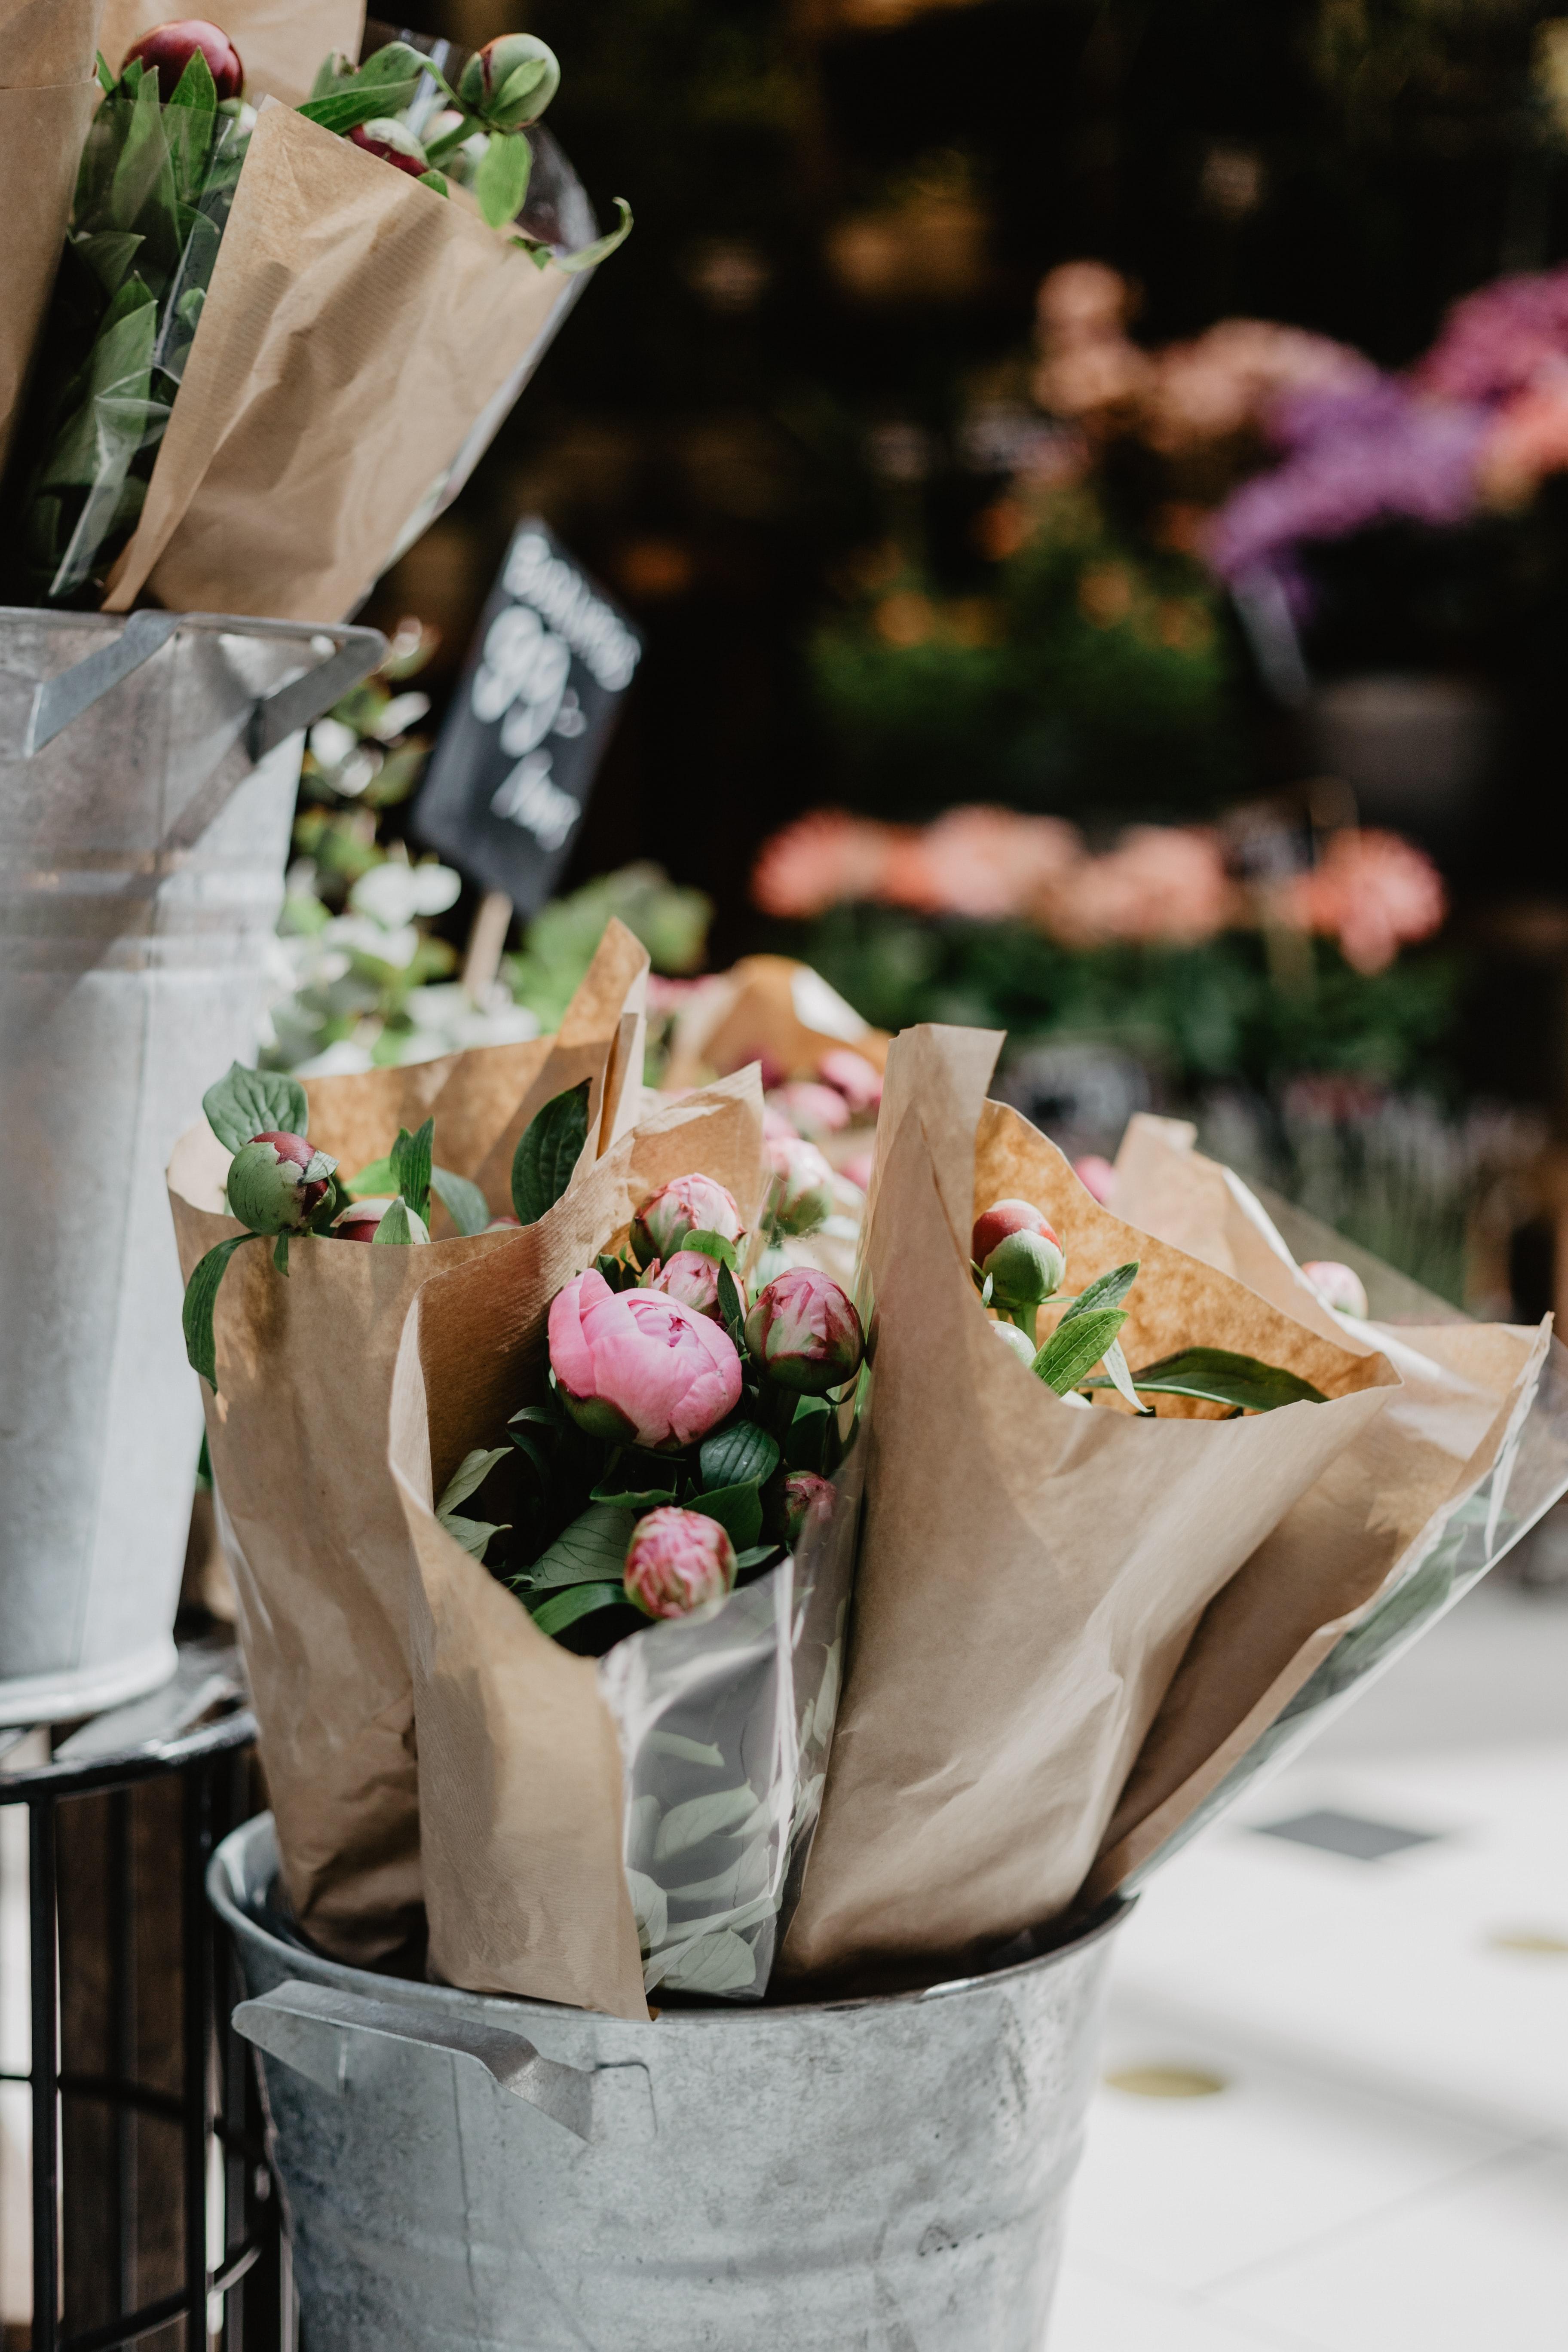 Pink Flower Bouquets On Bucket Photo Free Plant Image On Unsplash